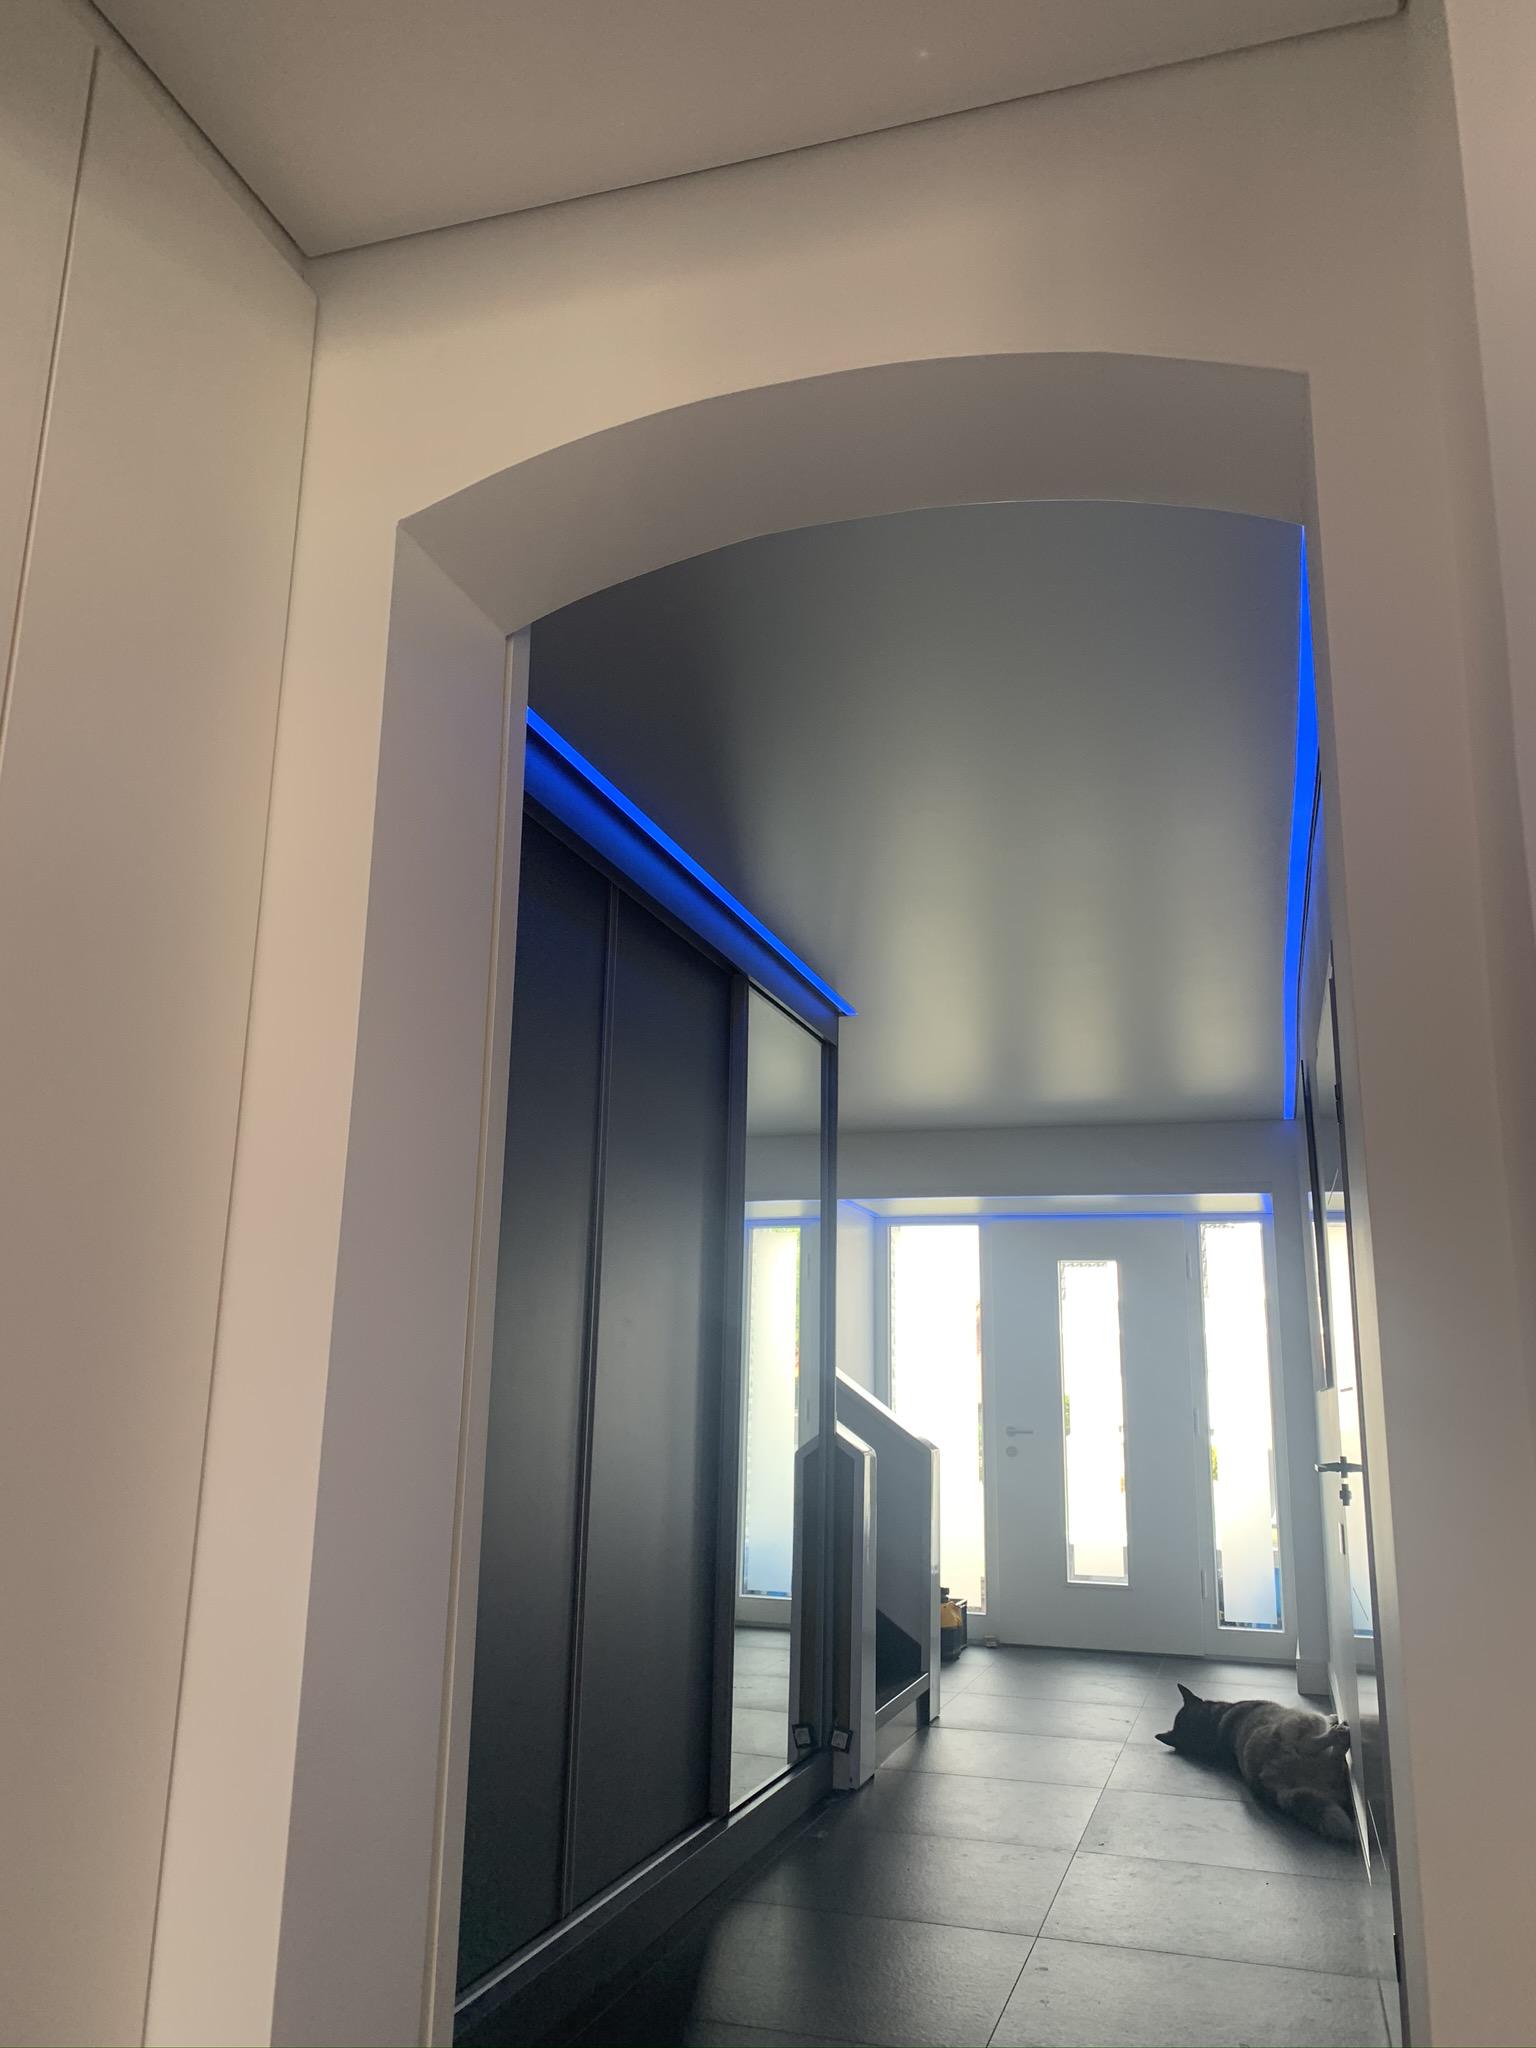 gekleurde rand LED verlichting in hal en overloop